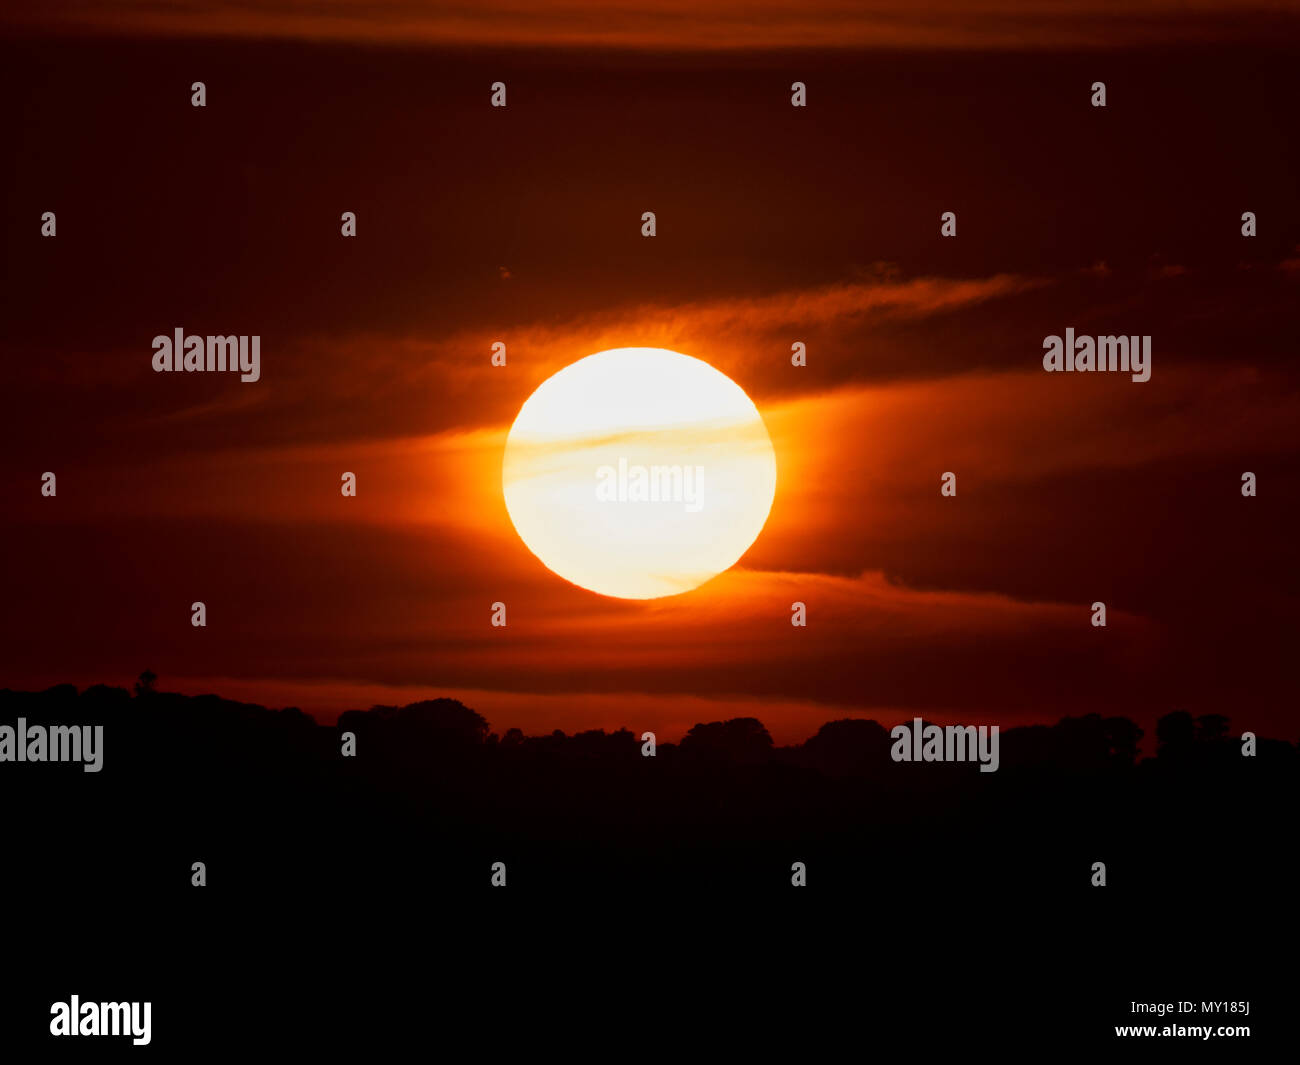 Ashbourne, Derbyshire. 5th Jun, 2018. UK Weather: spectacular sunset over the ancient woods Hazleton Clump Cairn near Thorpe taken from Ashbourne Derbyshire, Peak District National Park Credit: Doug Blane/Alamy Live News Stock Photo